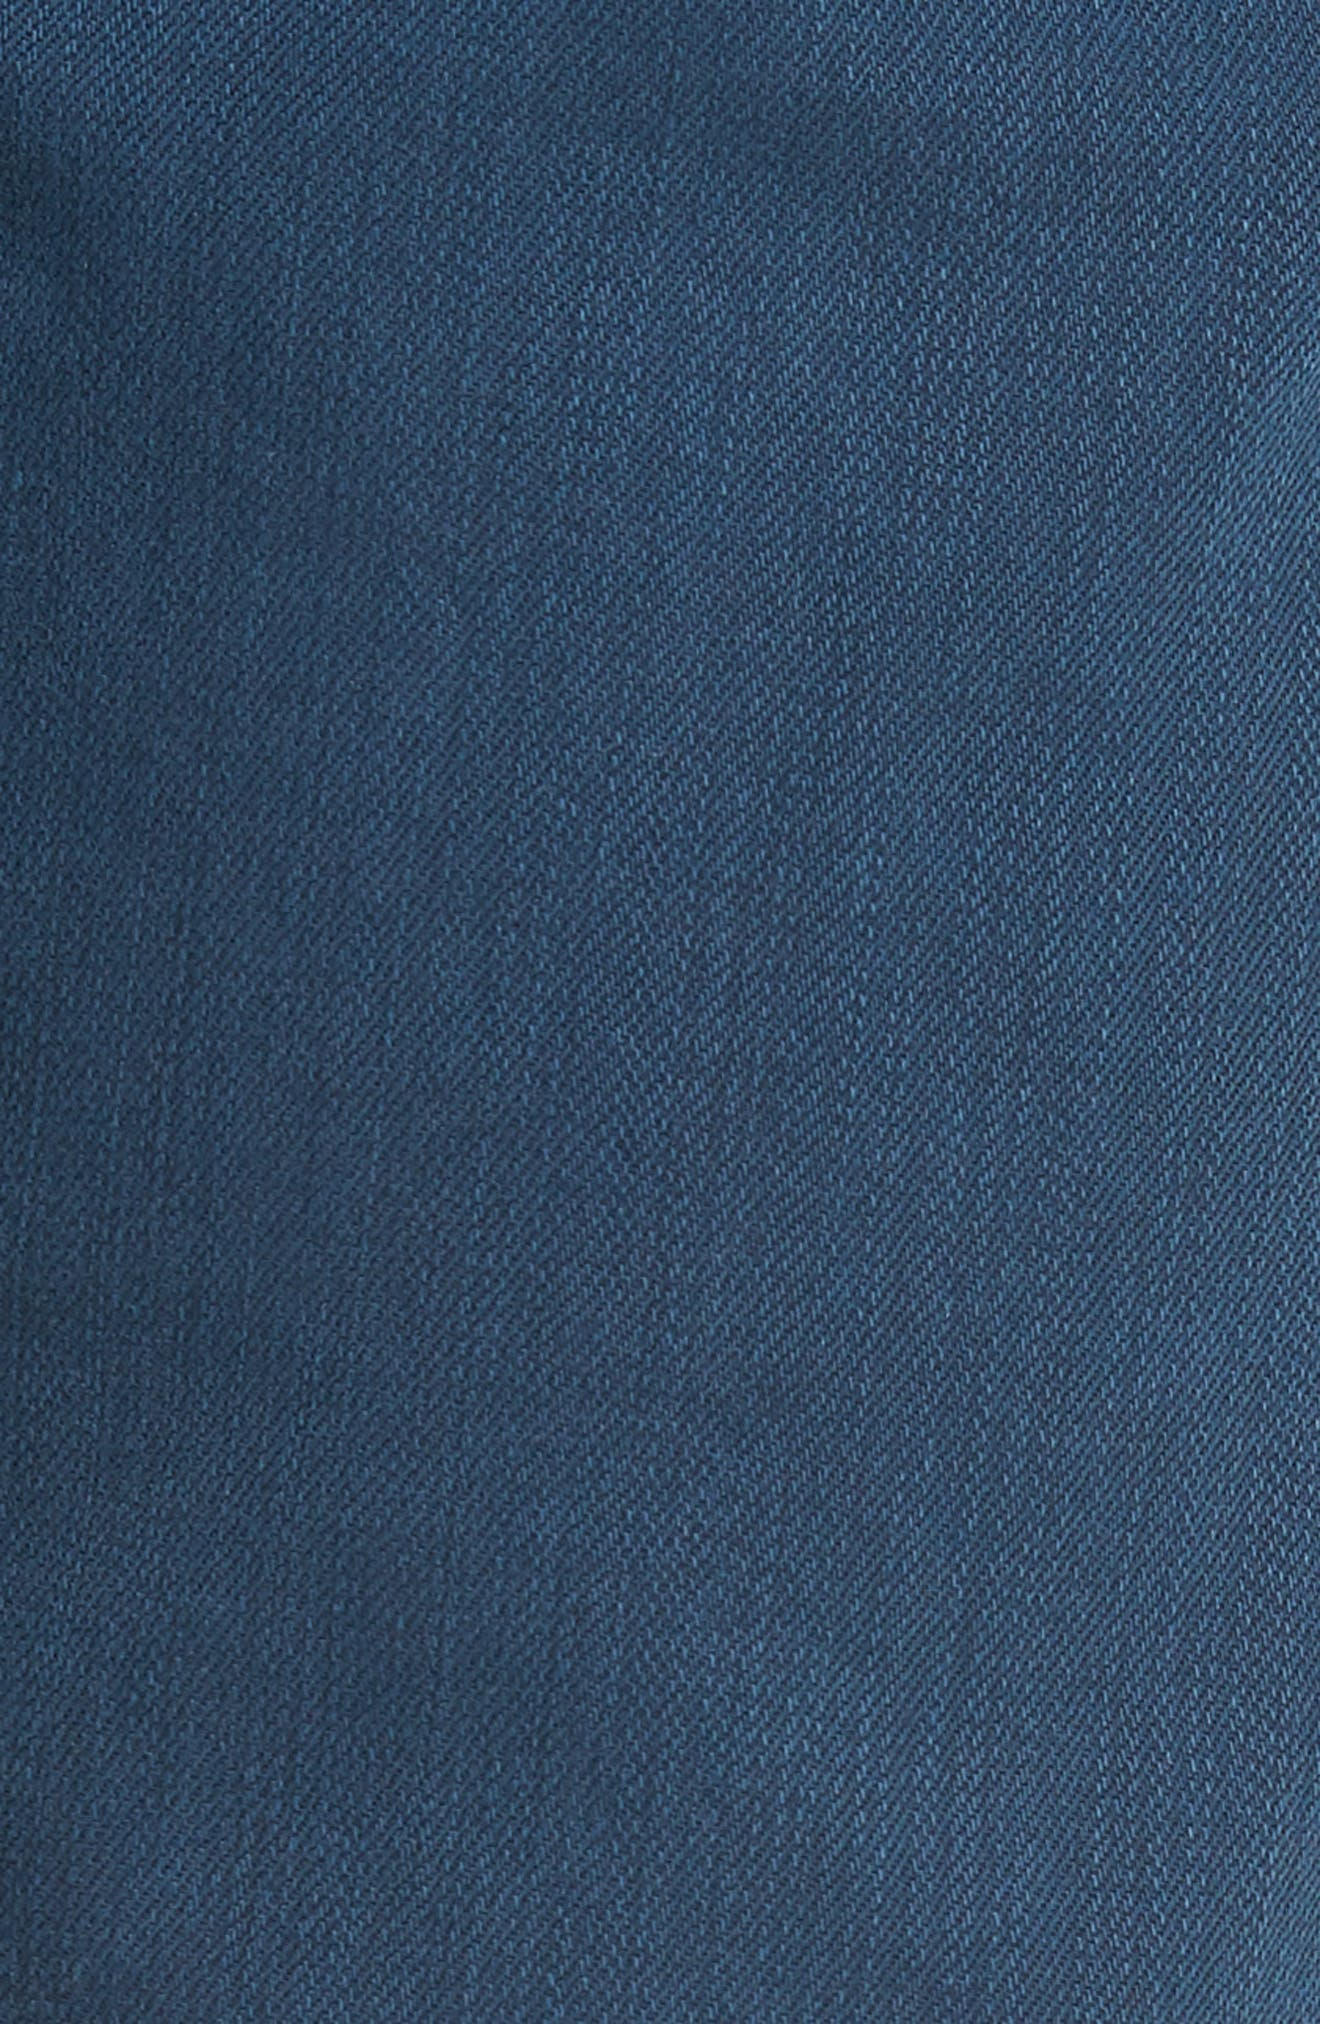 Jimmy Slim Straight Leg Jeans,                             Alternate thumbnail 5, color,                             400